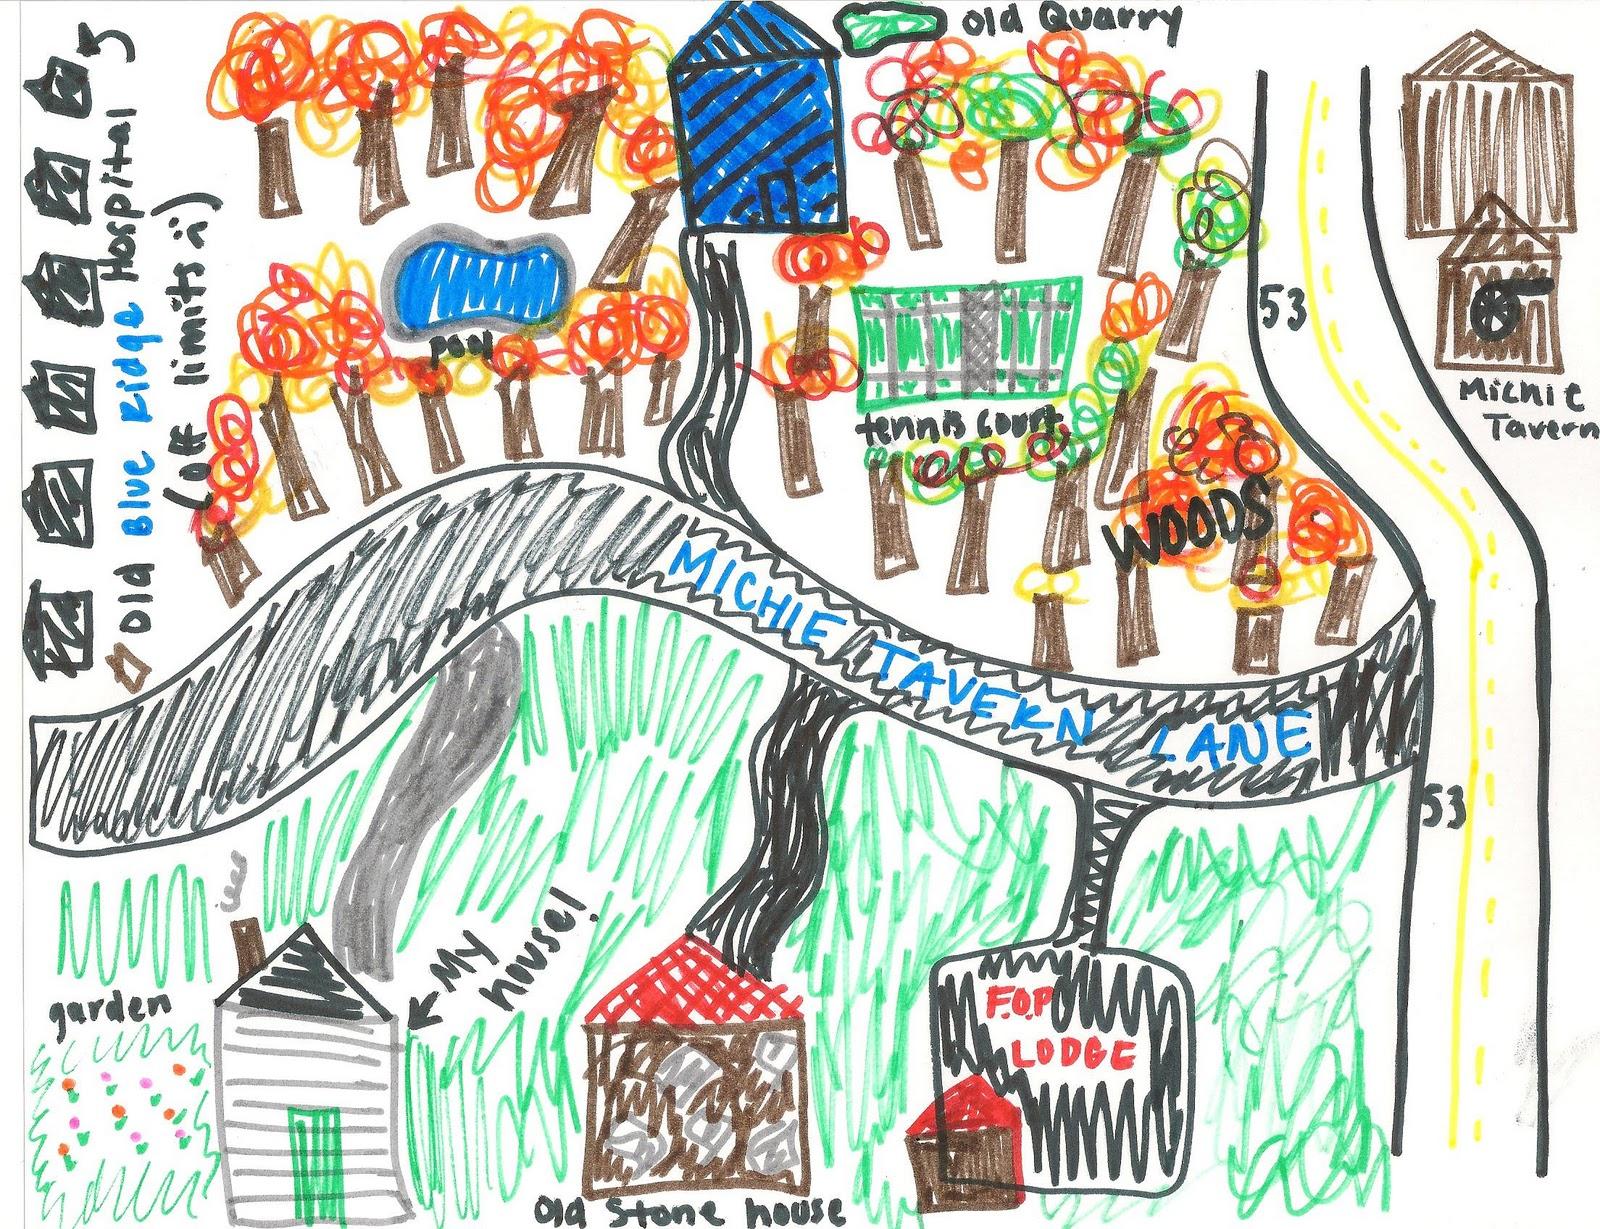 Caroline's Journal: My Neighborhood